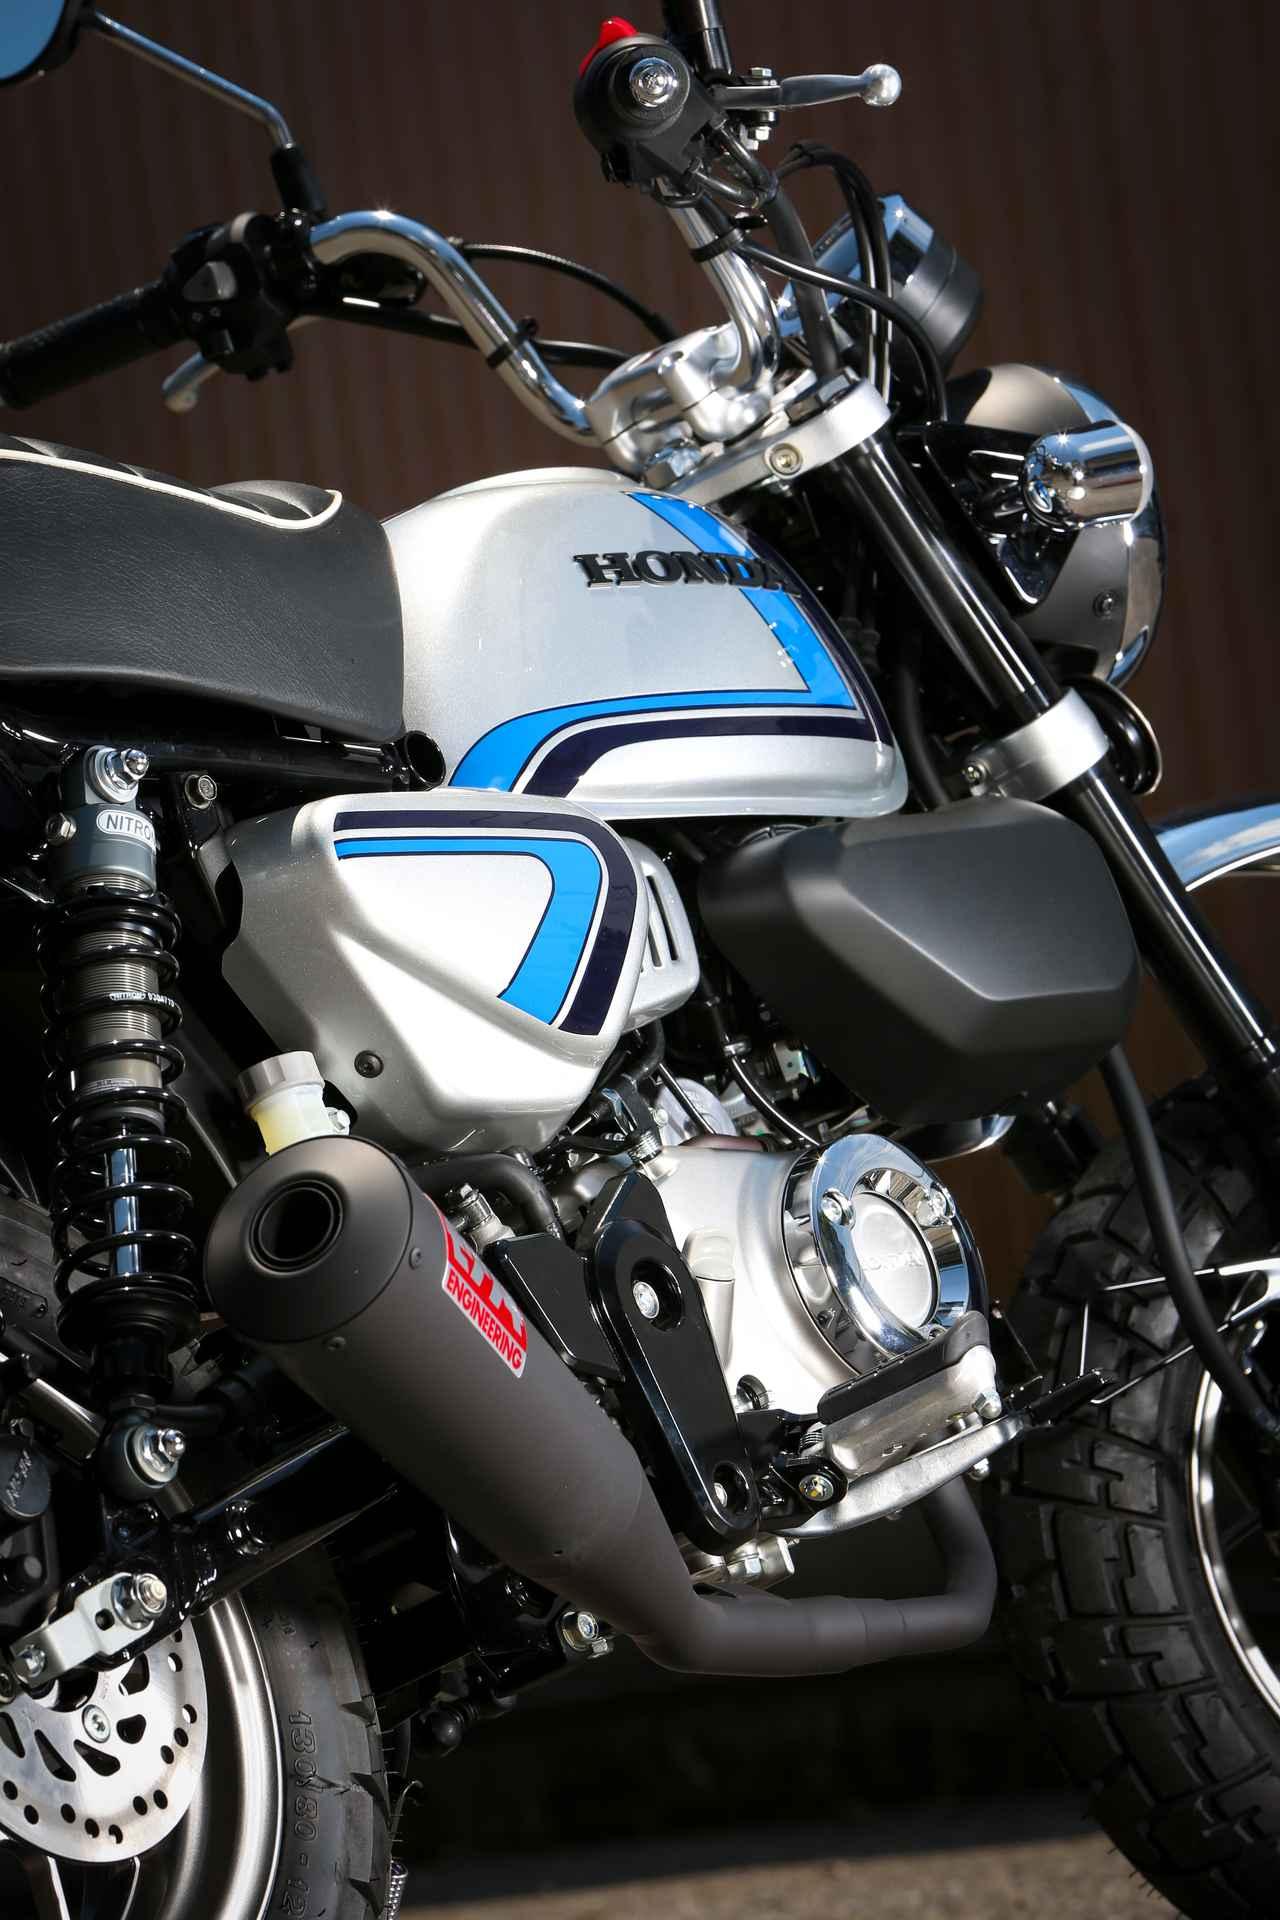 Images : 5番目の画像 - 気になるモンキーFSの写真をもっと見る! - LAWRENCE - Motorcycle x Cars + α = Your Life.